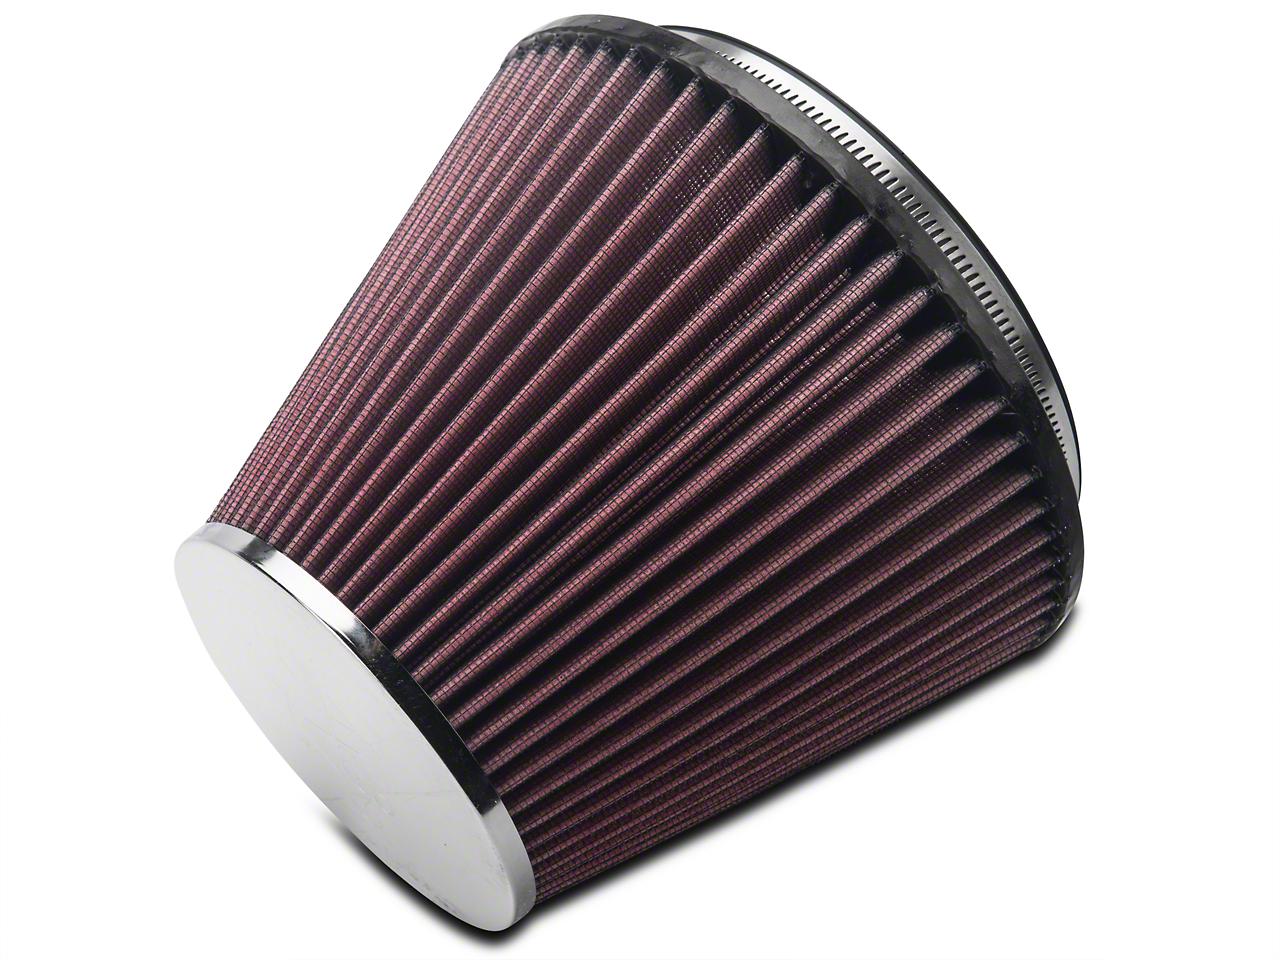 K&N Replacement Cold Air Intake Filter (07-11 3.8L Wrangler JK)